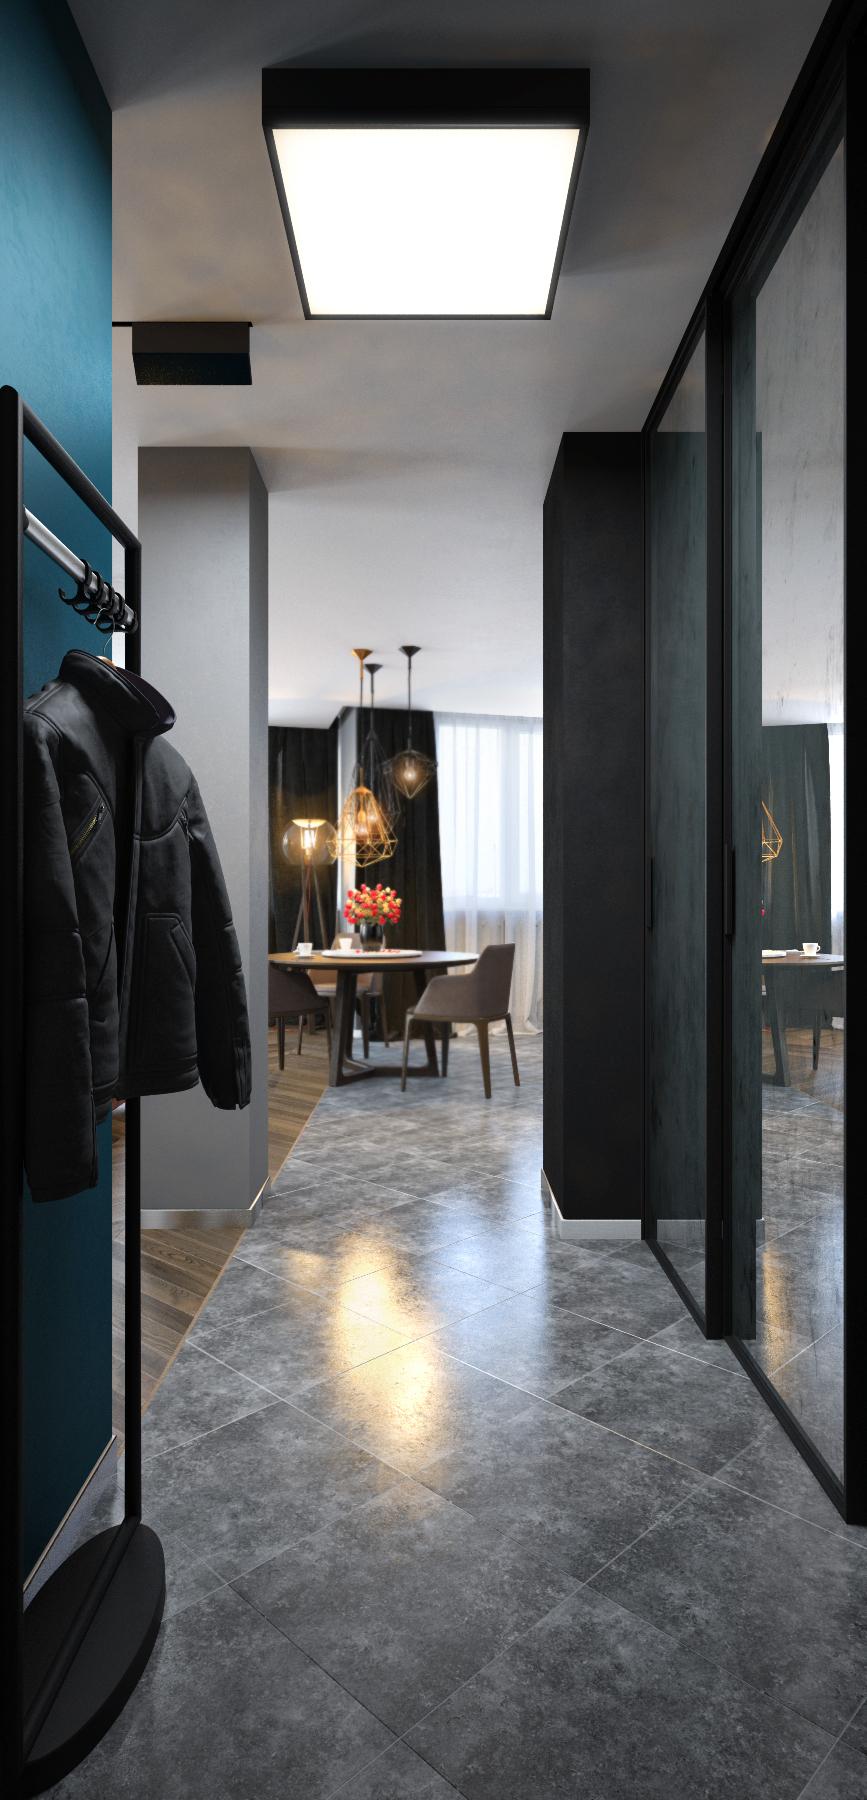 Interior design visyalisation visual effects luxury